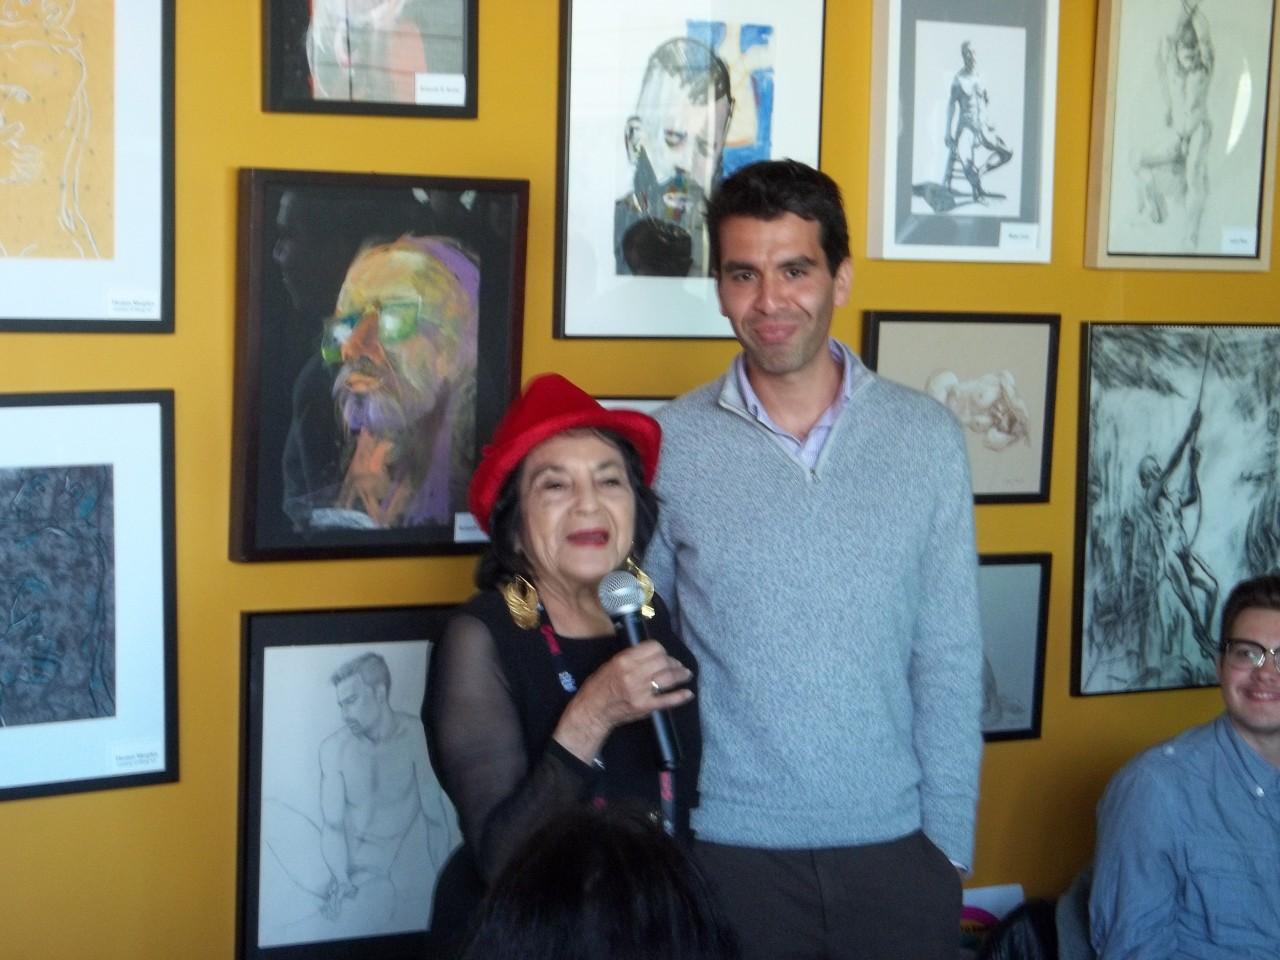 Huerta compliments Rivas. Photo by Frank Perez.